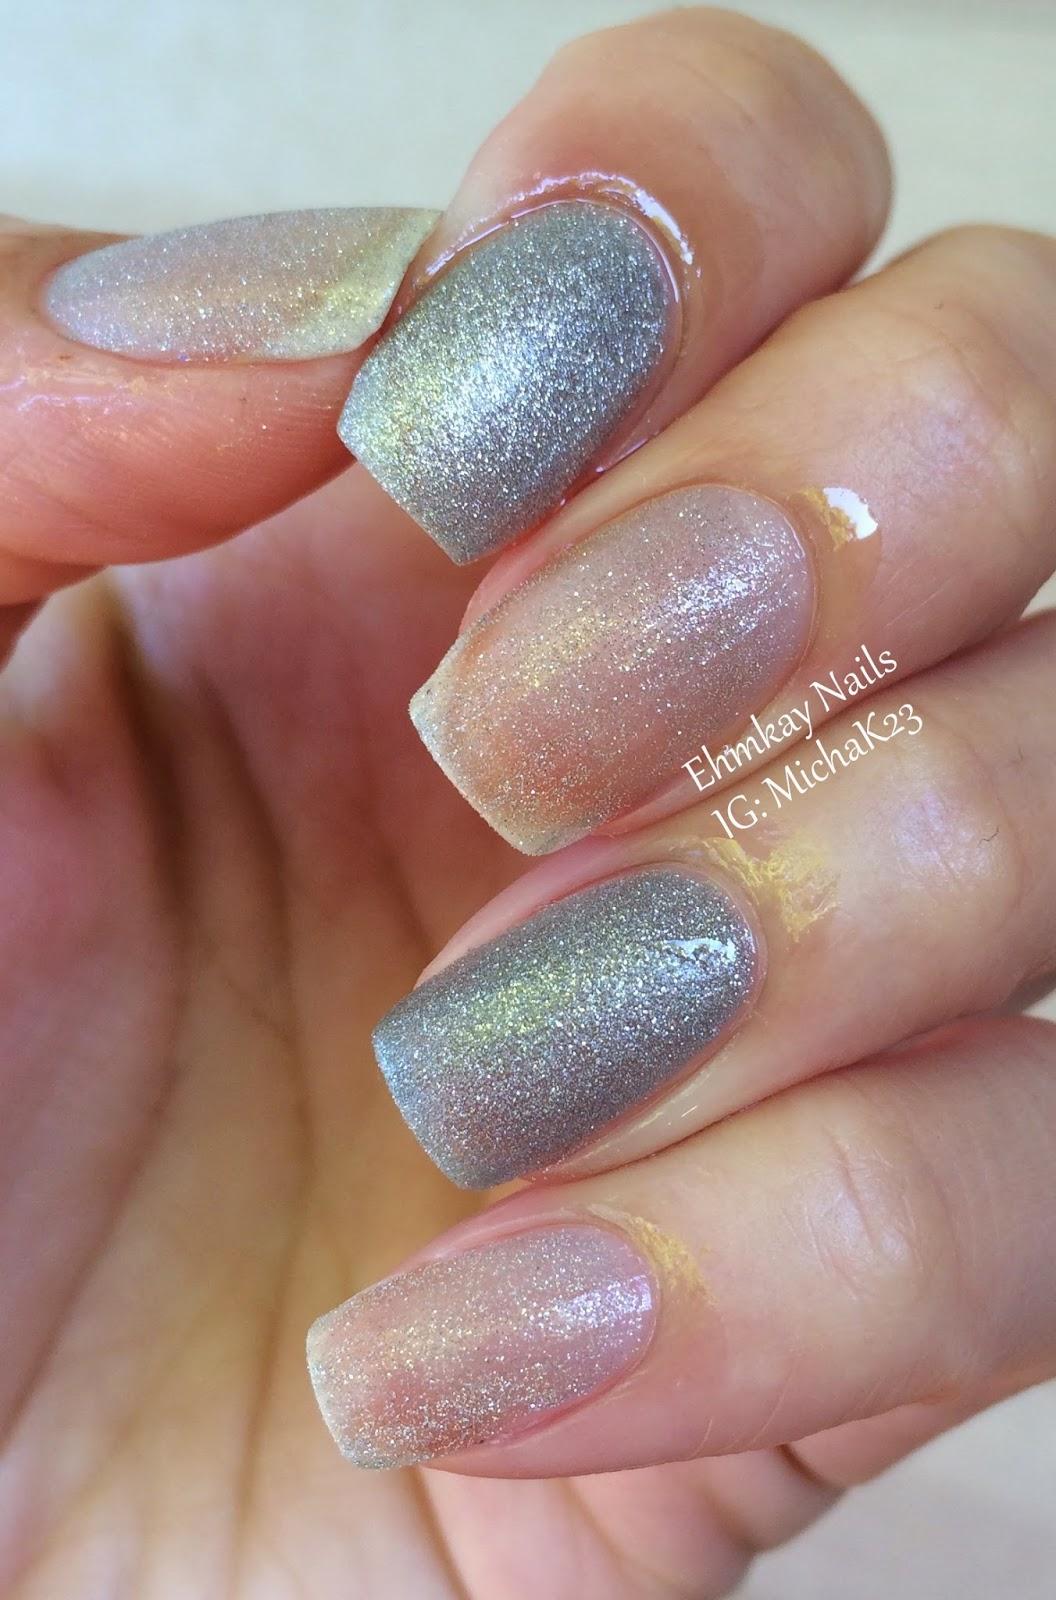 ehmkay nails: Serum No. 5 Flashing Lights and Cuticle Serum Review